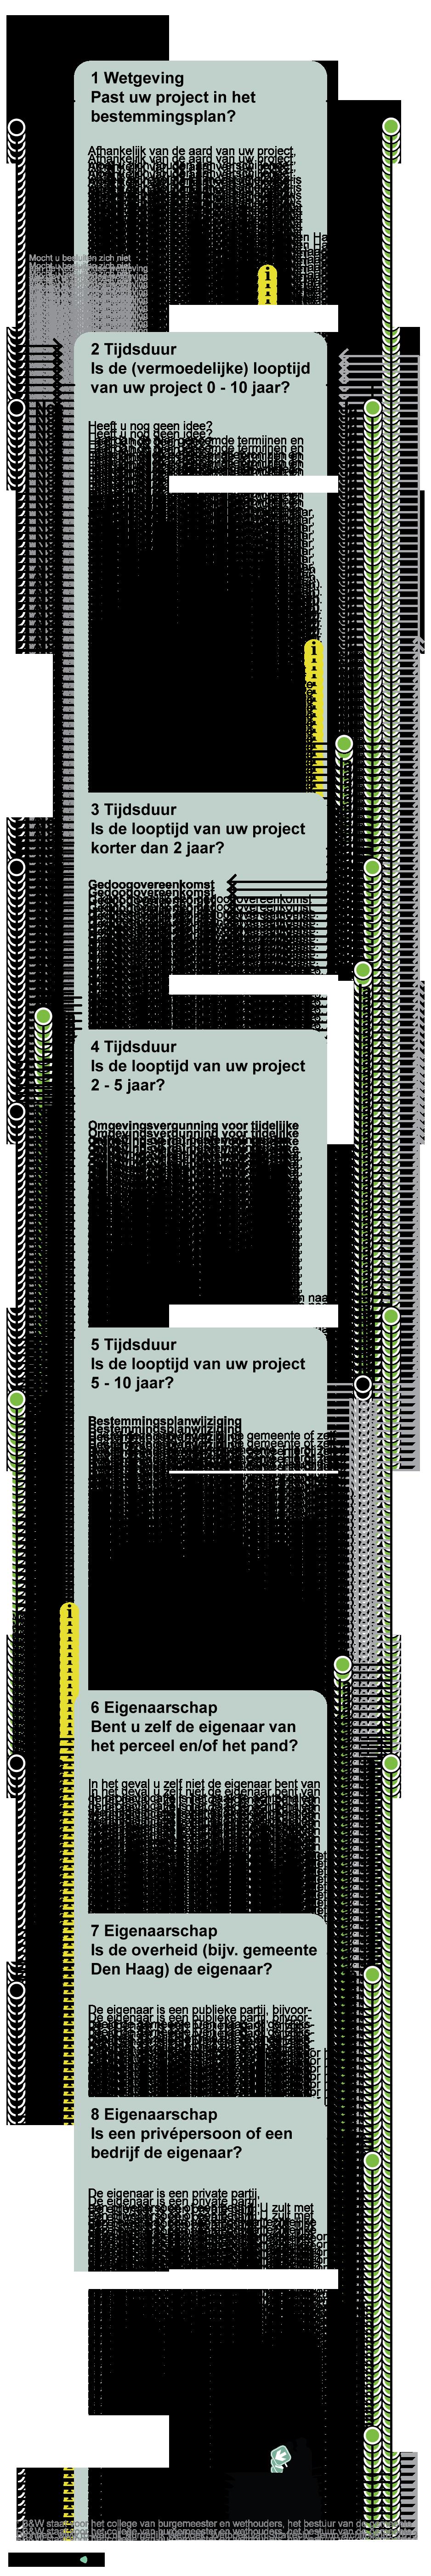 Vraagboomjuridischschema-01